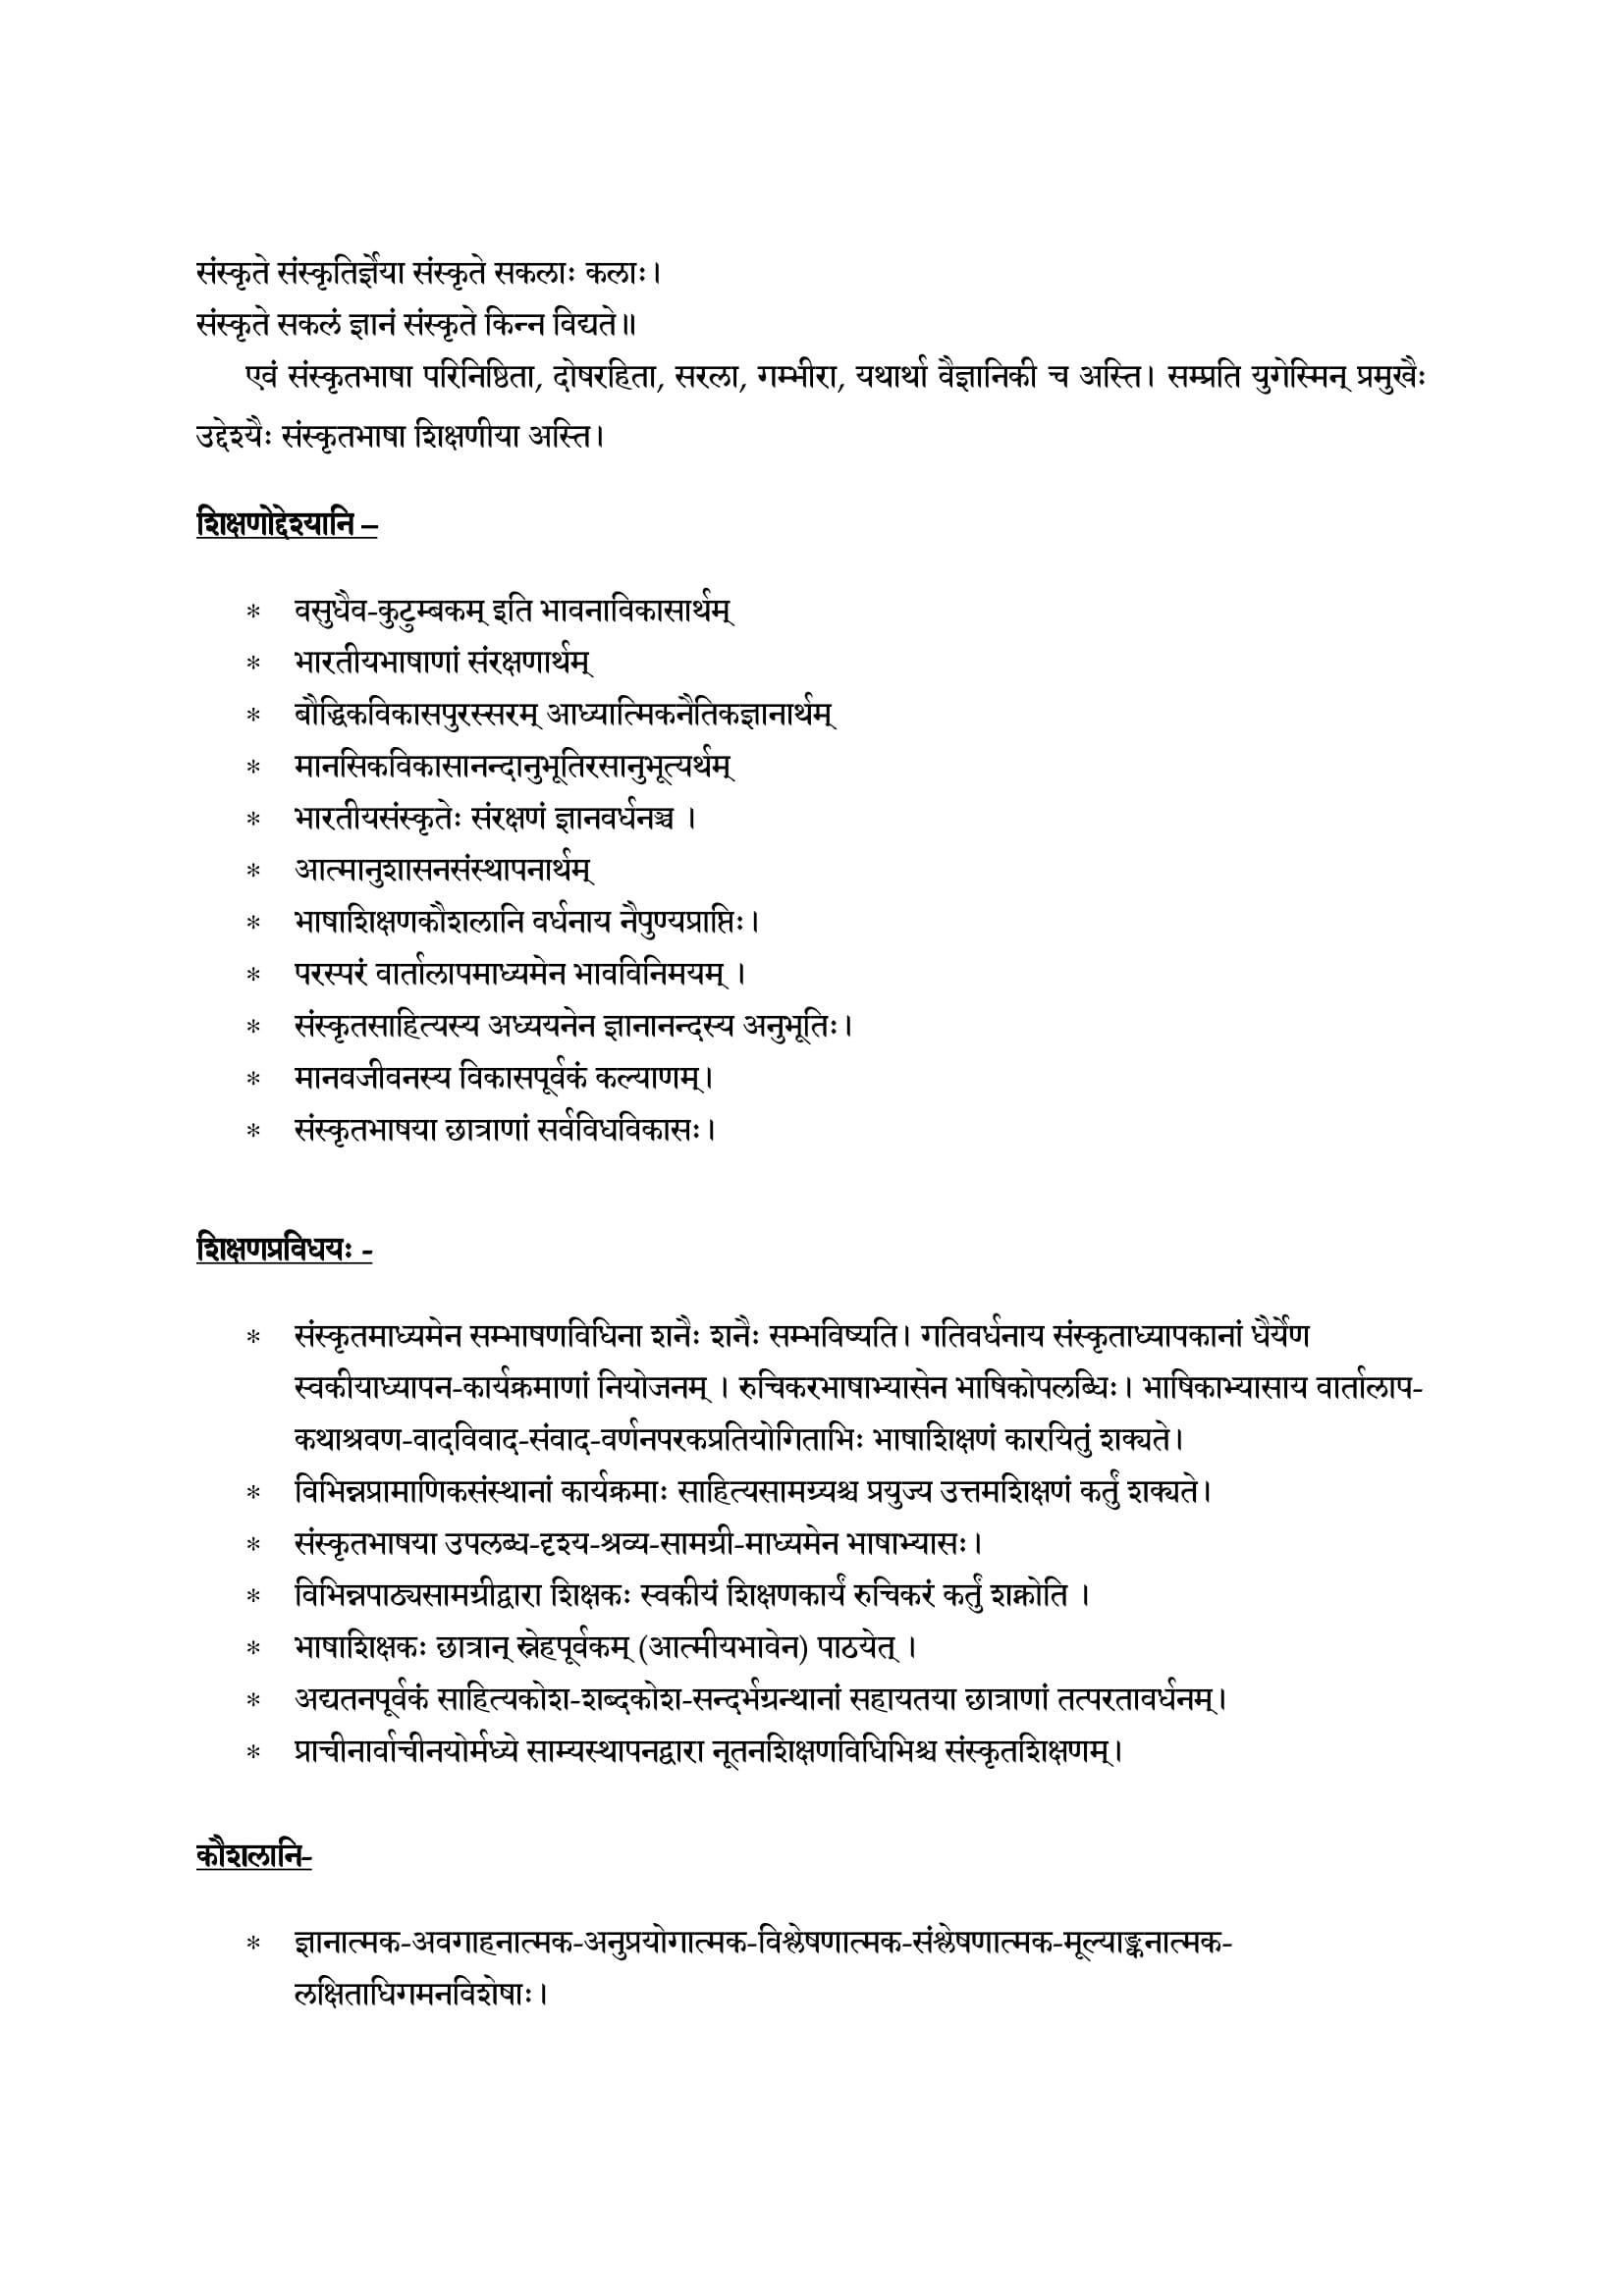 Sanskrit Sec 2020 21 class 9 10 02 1